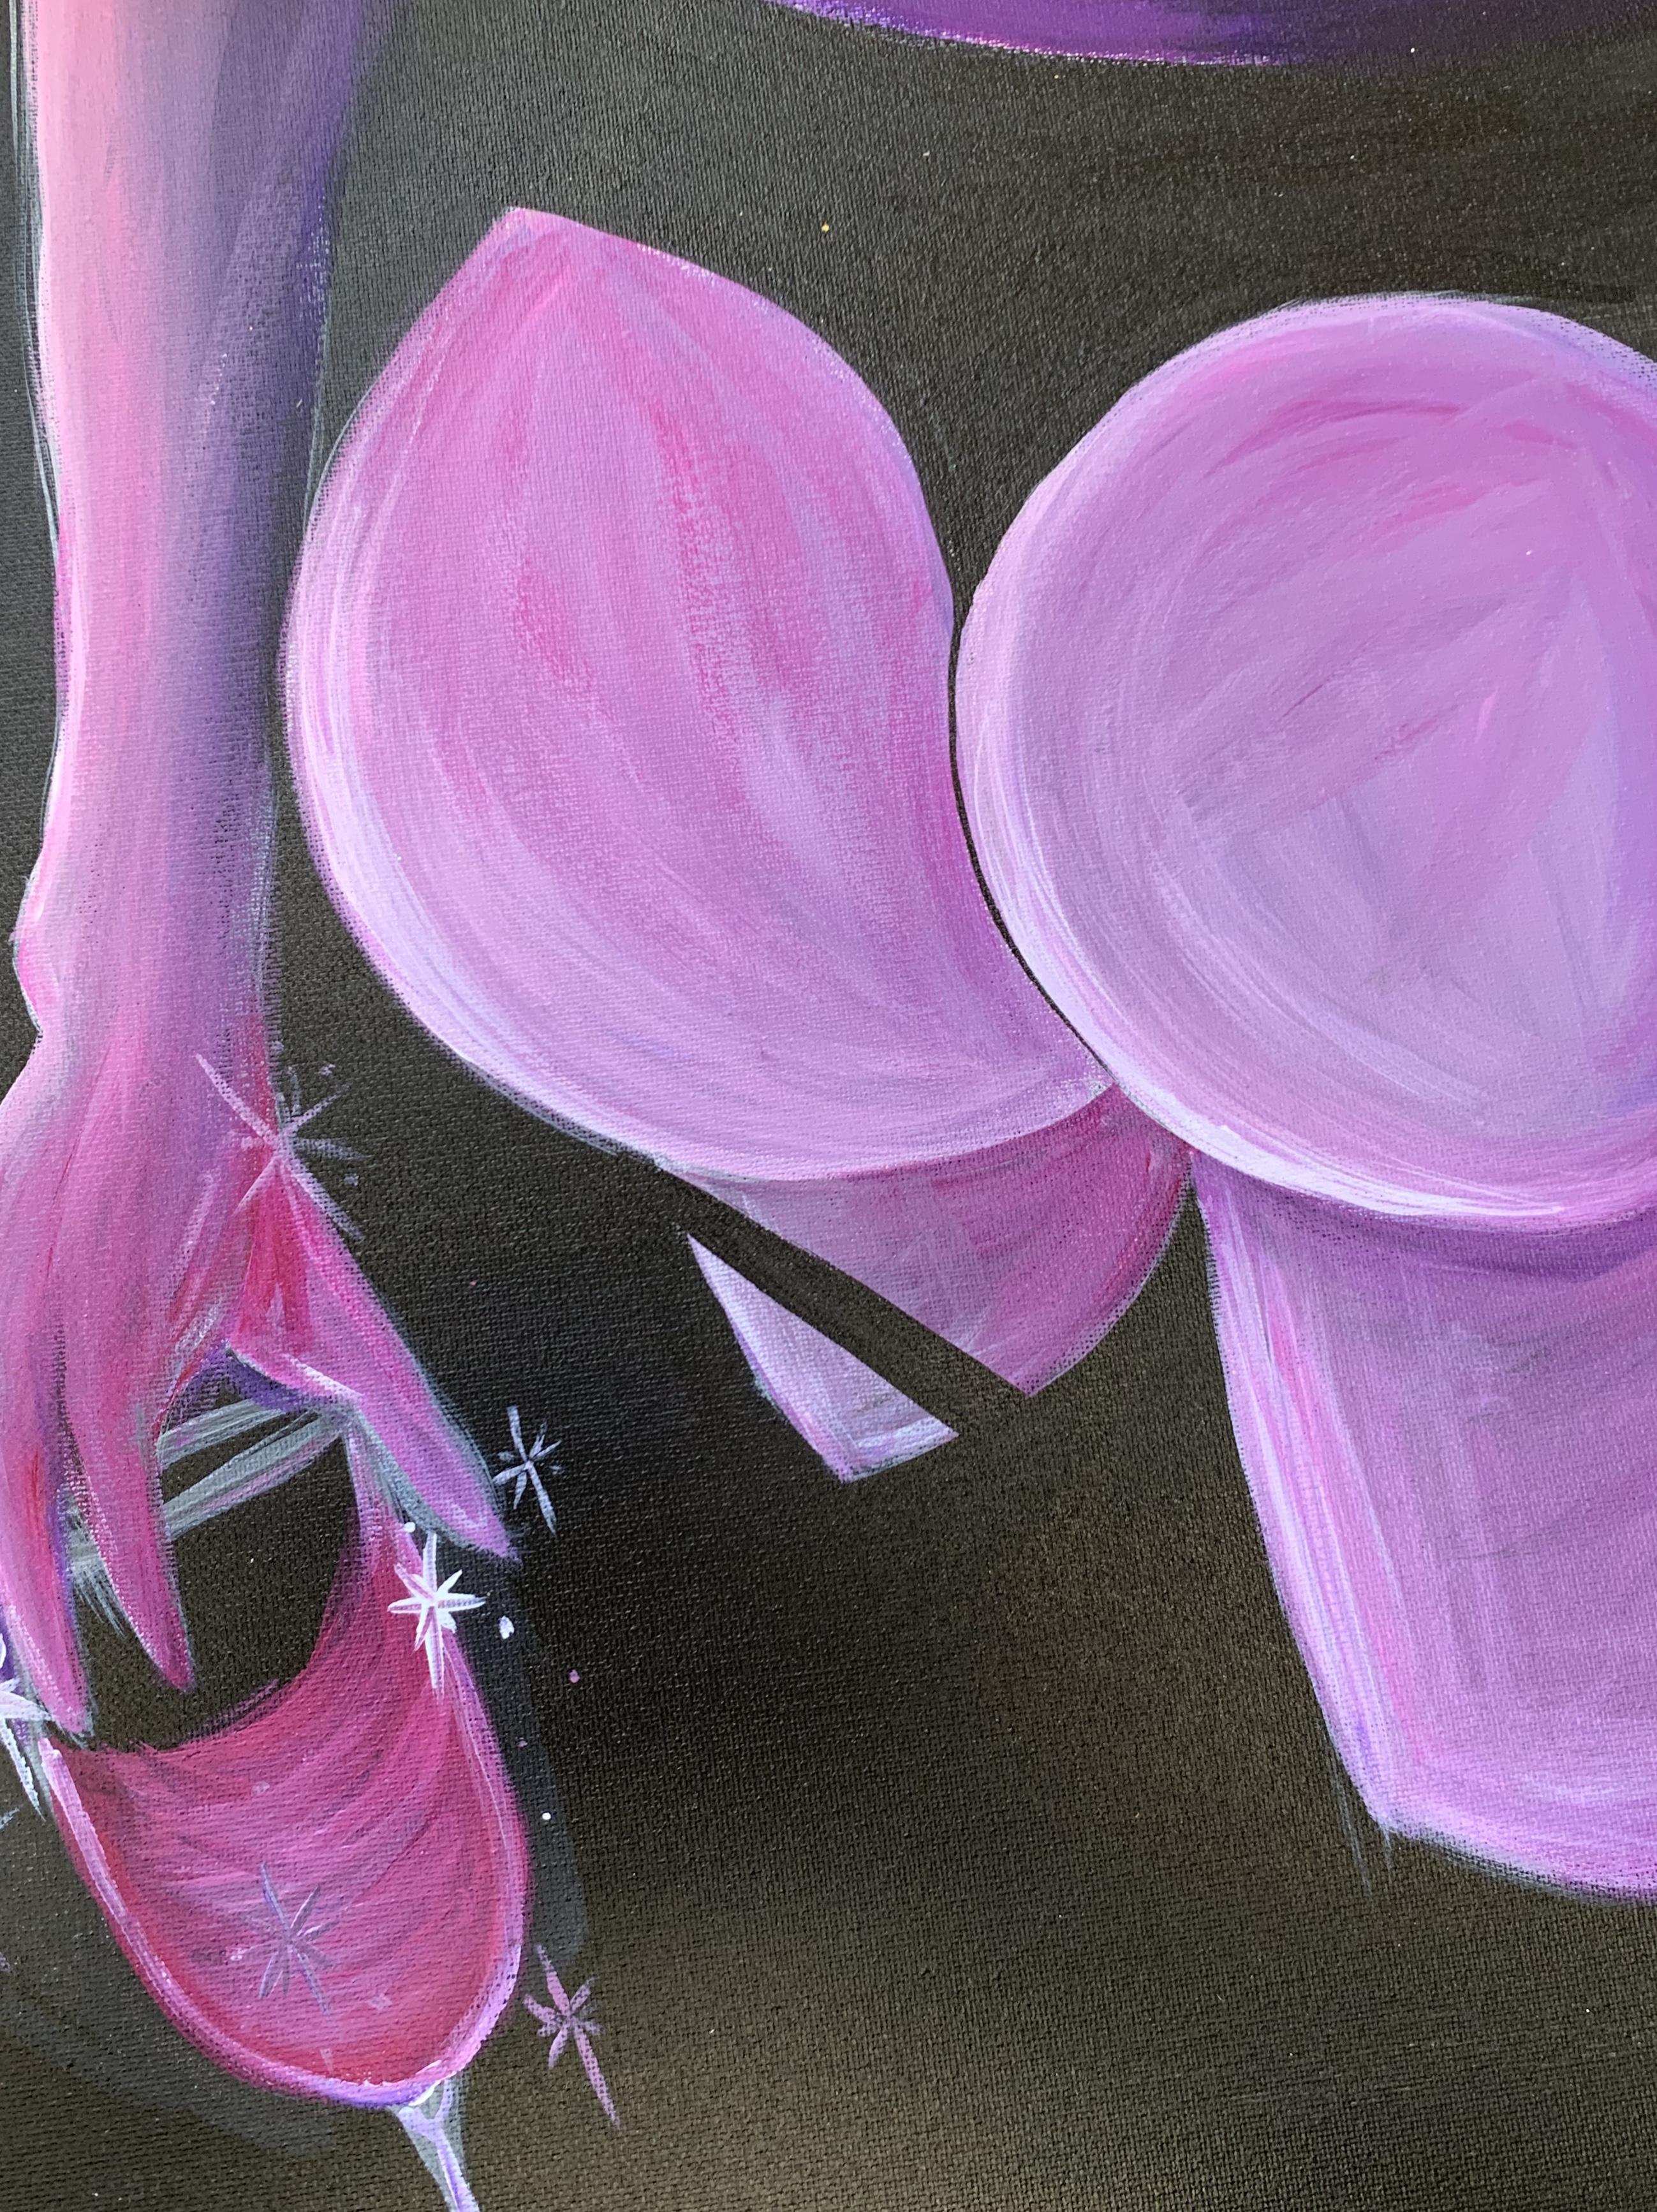 Midnight 16x20 Canvas Painting